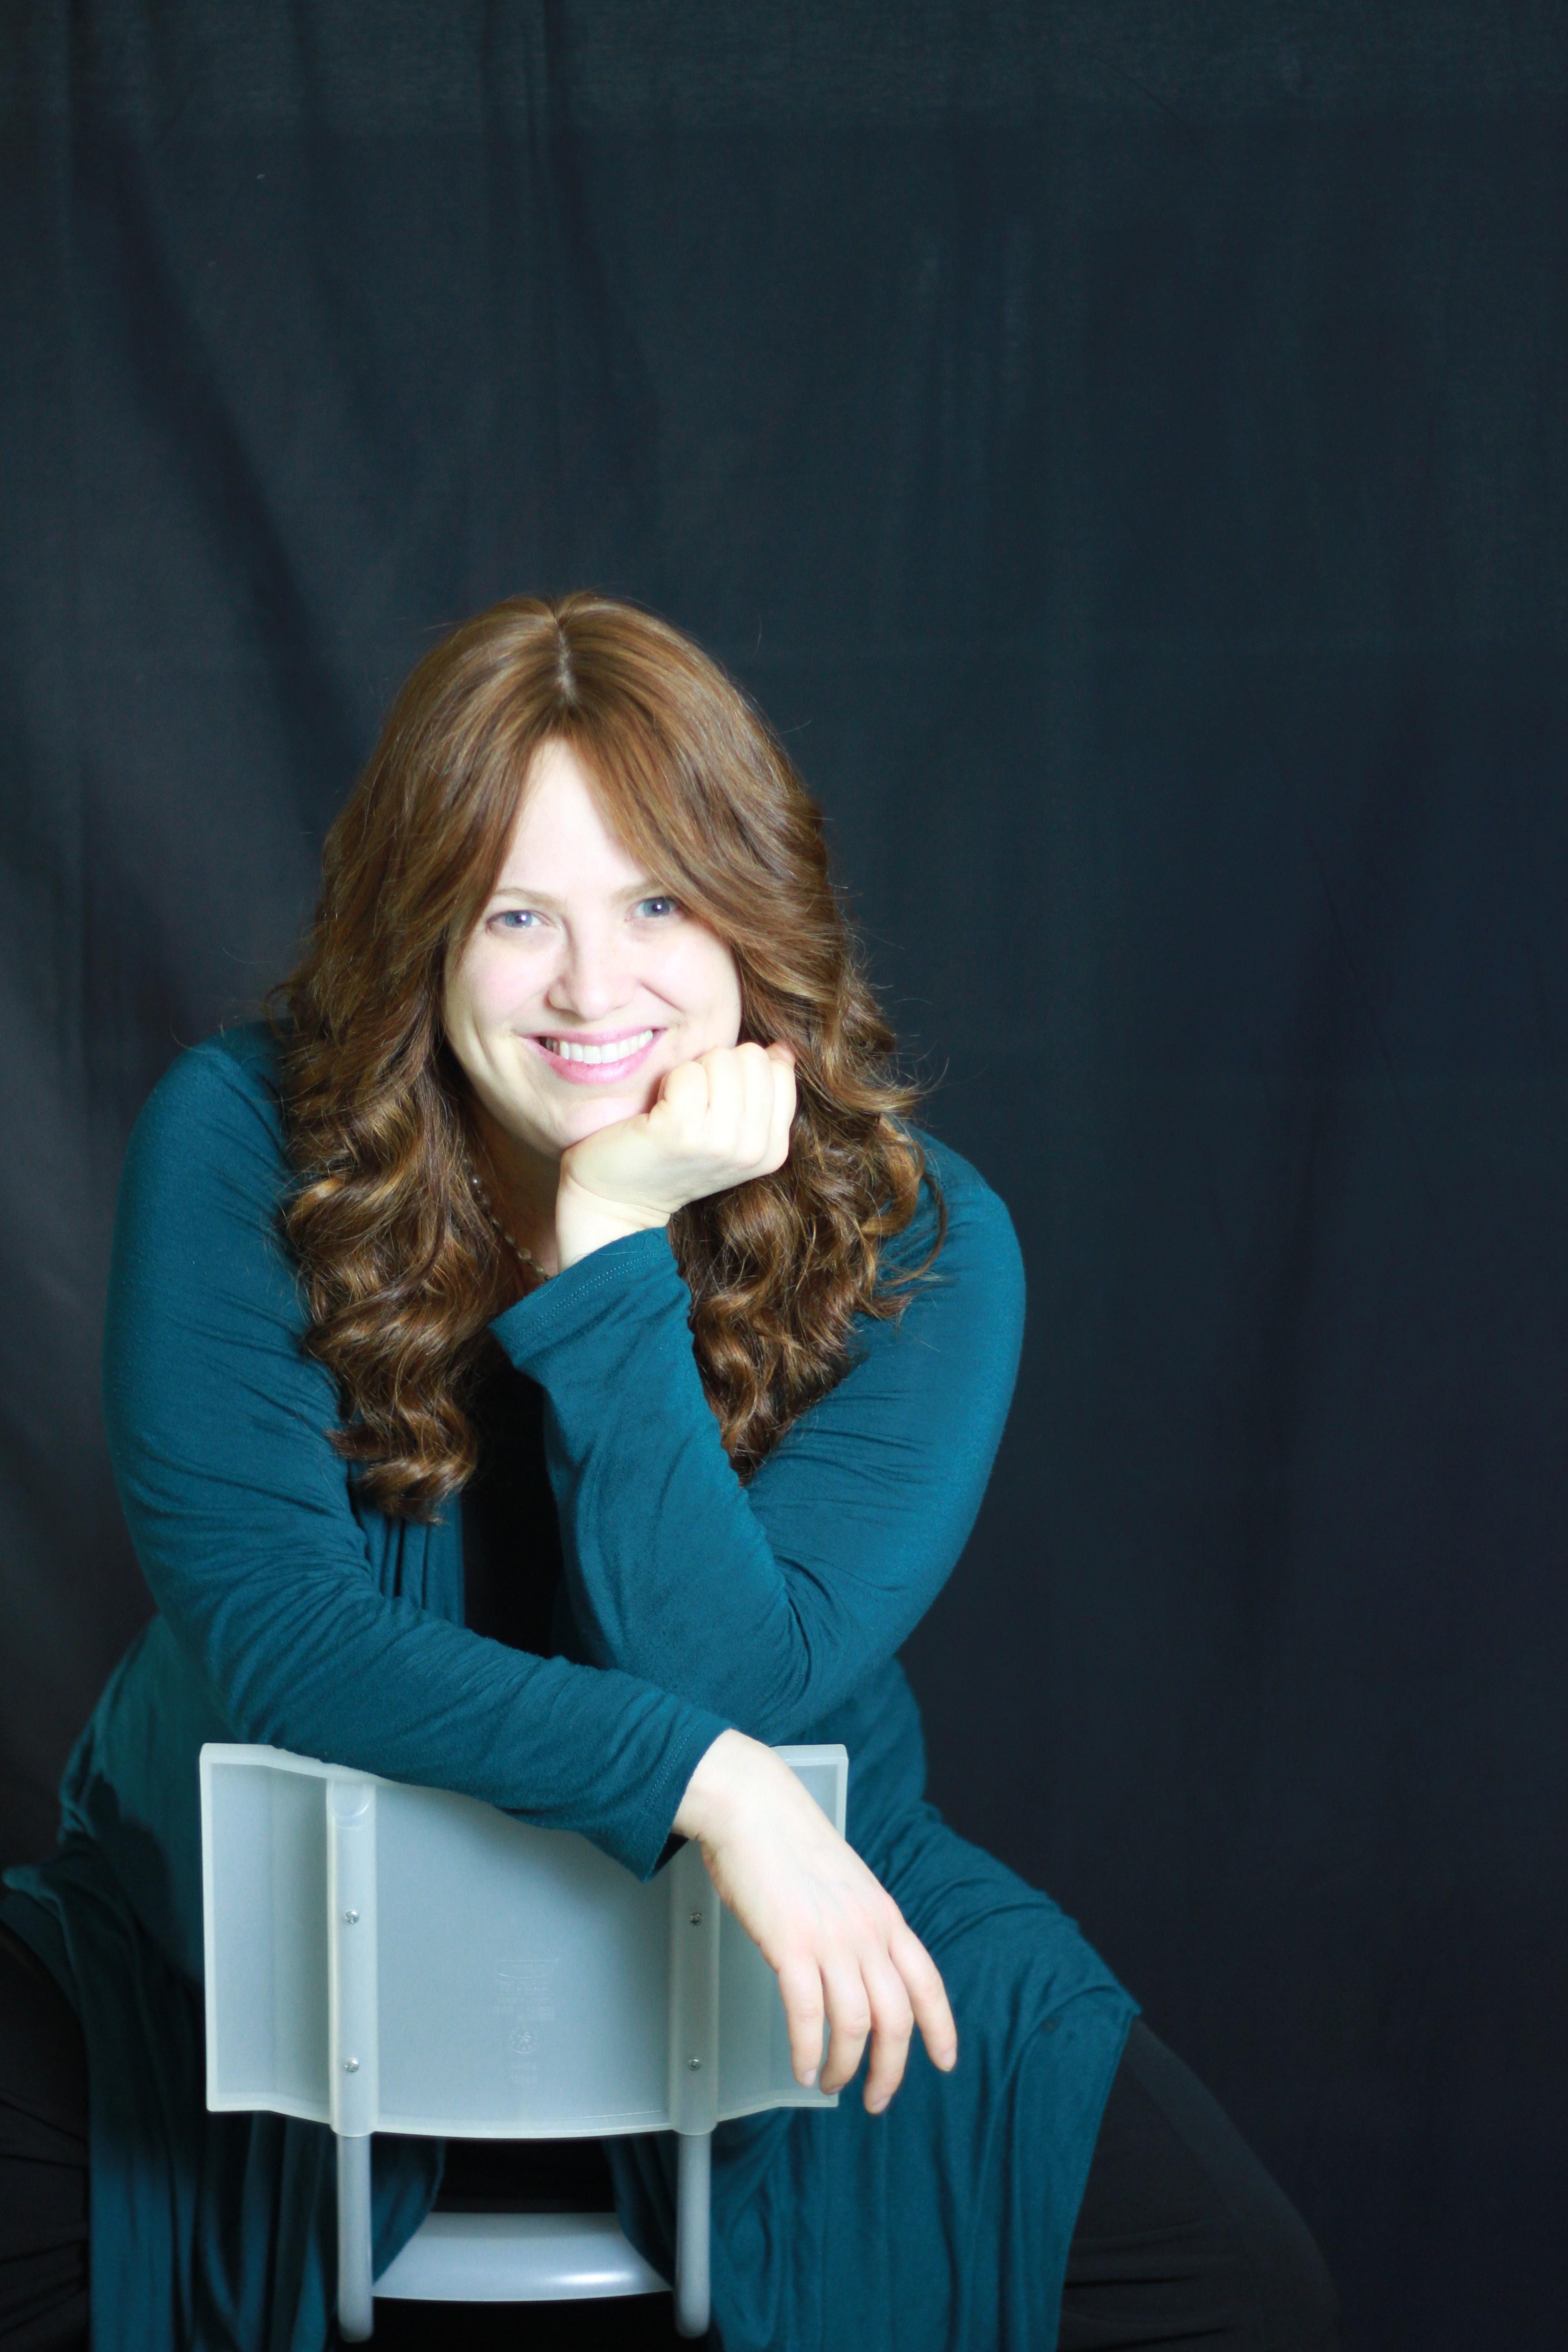 Sarah Zeldman; Social Media Expert